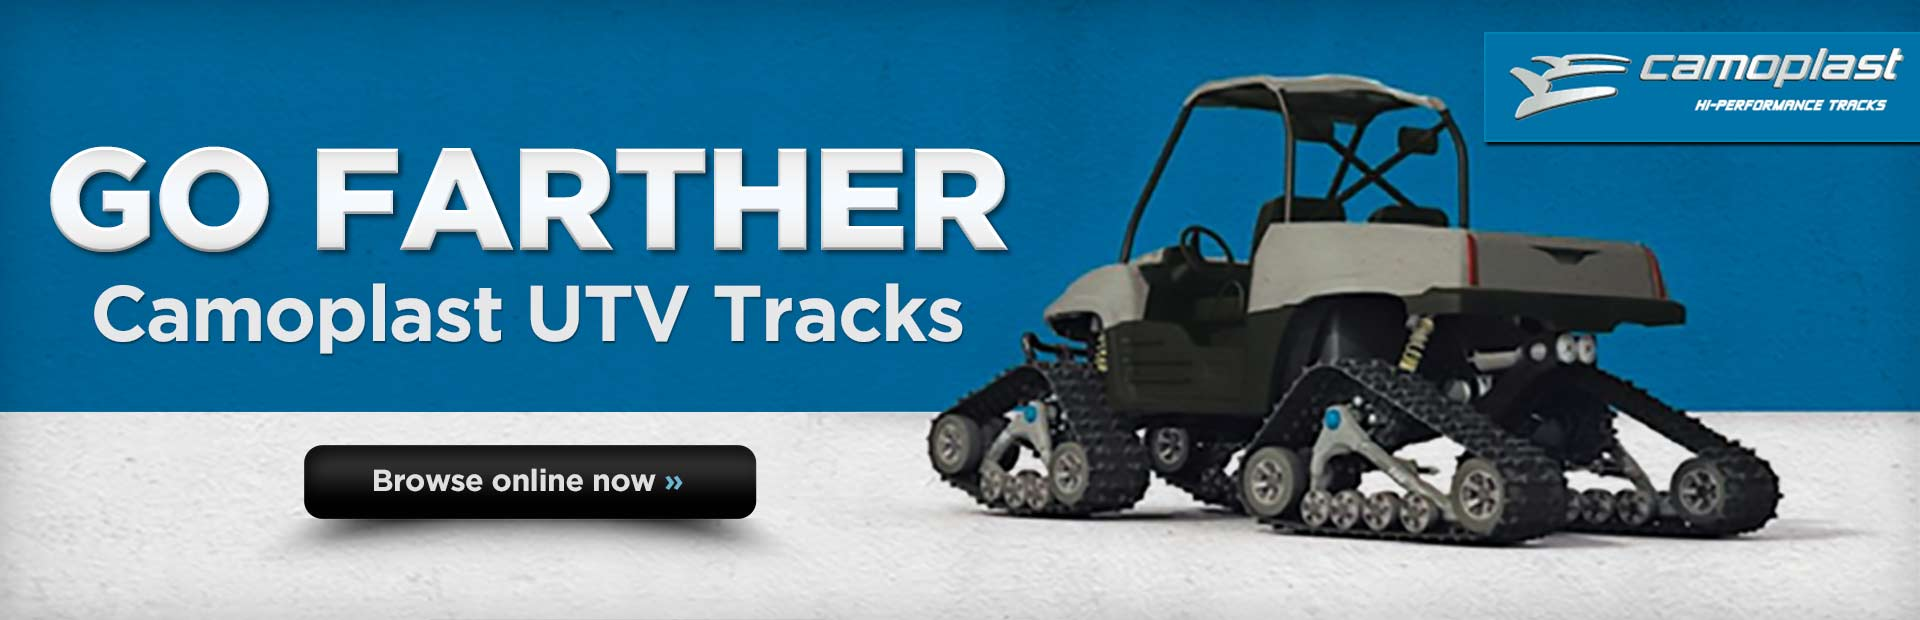 Click here to browse Camoplast UTV tracks.